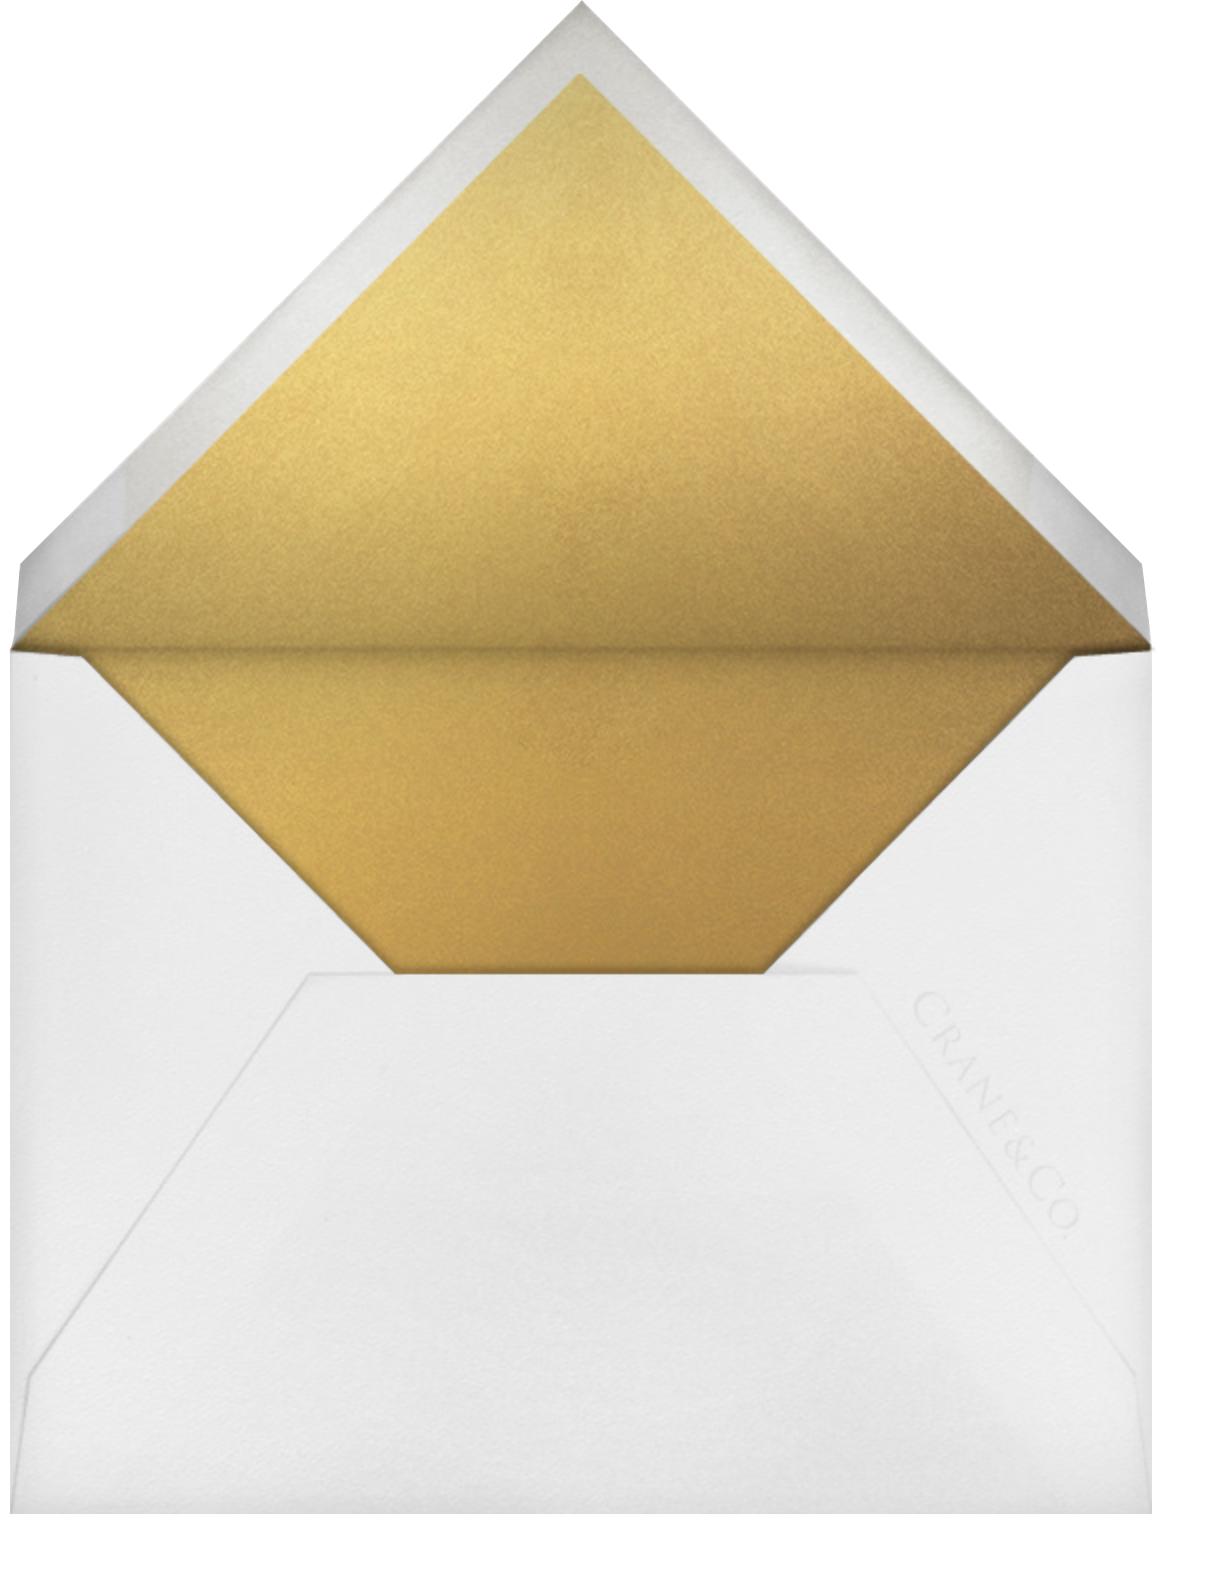 Tie the Knot (Save the Date) - Gold - Oscar de la Renta - Envelope